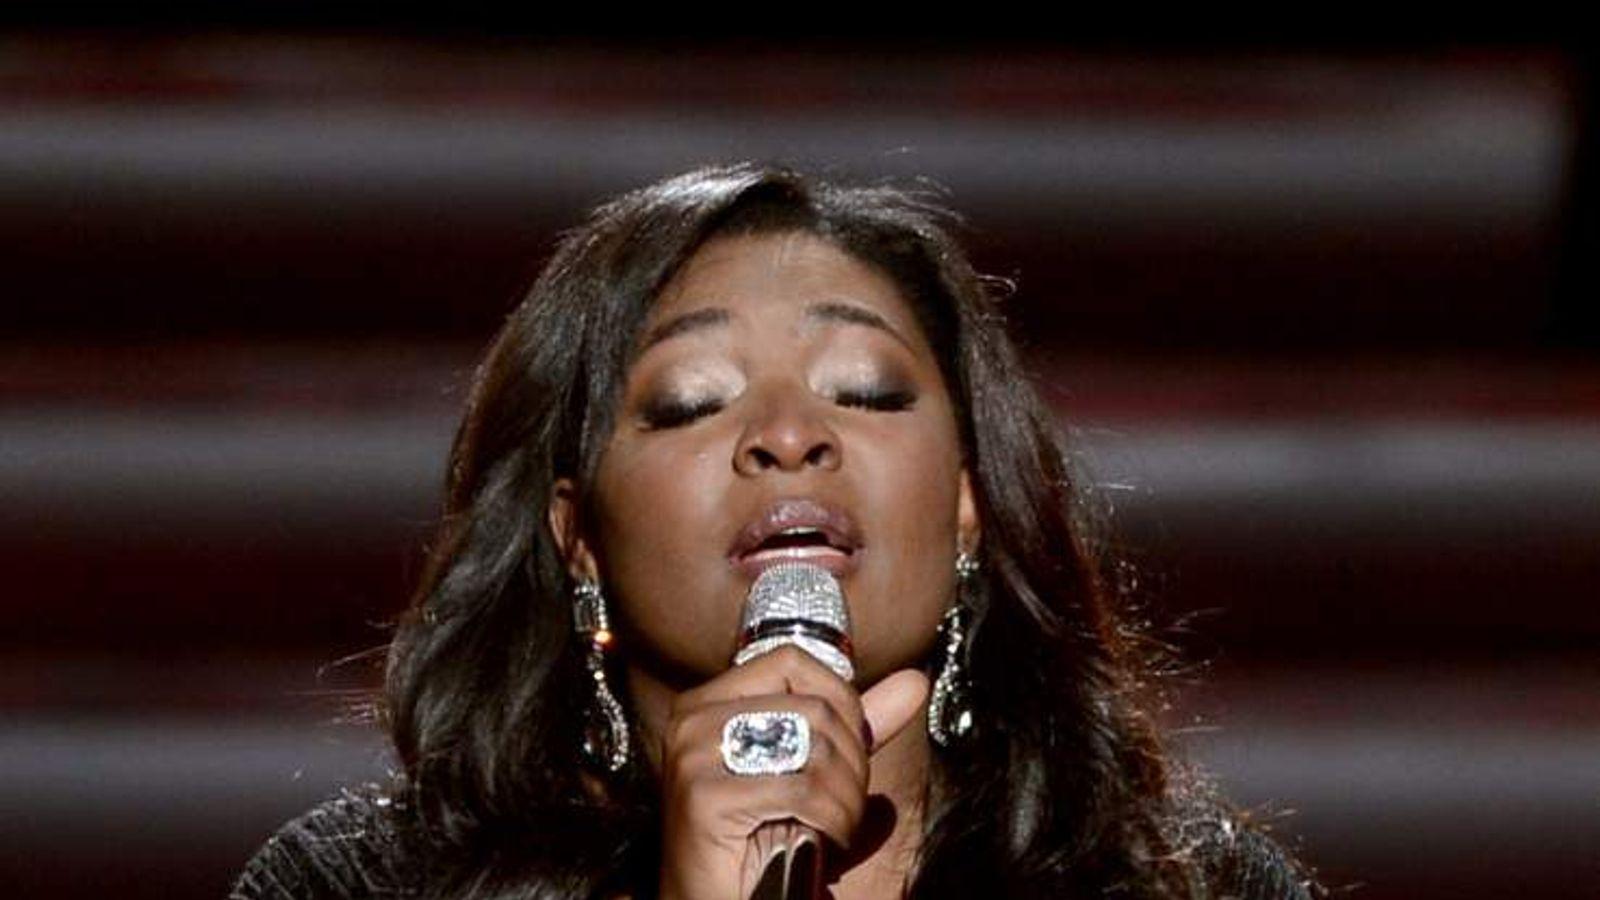 American Idol winner Candice Glover